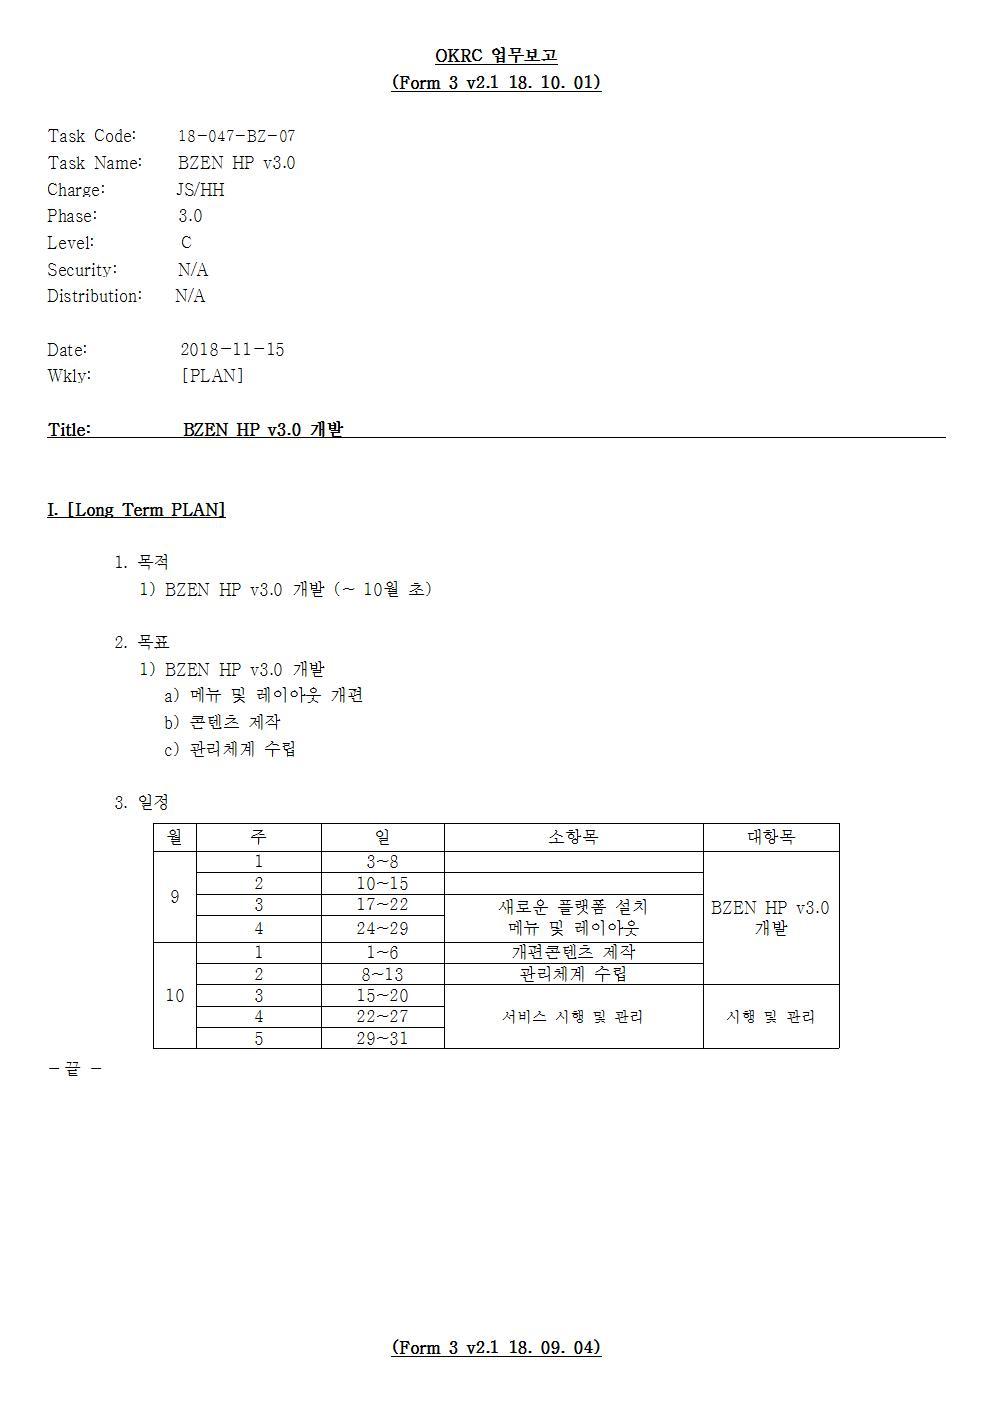 D-[18-047-BZ-07]-[BZEN HP v3.0]-[2018-11-15][HH]001.jpg